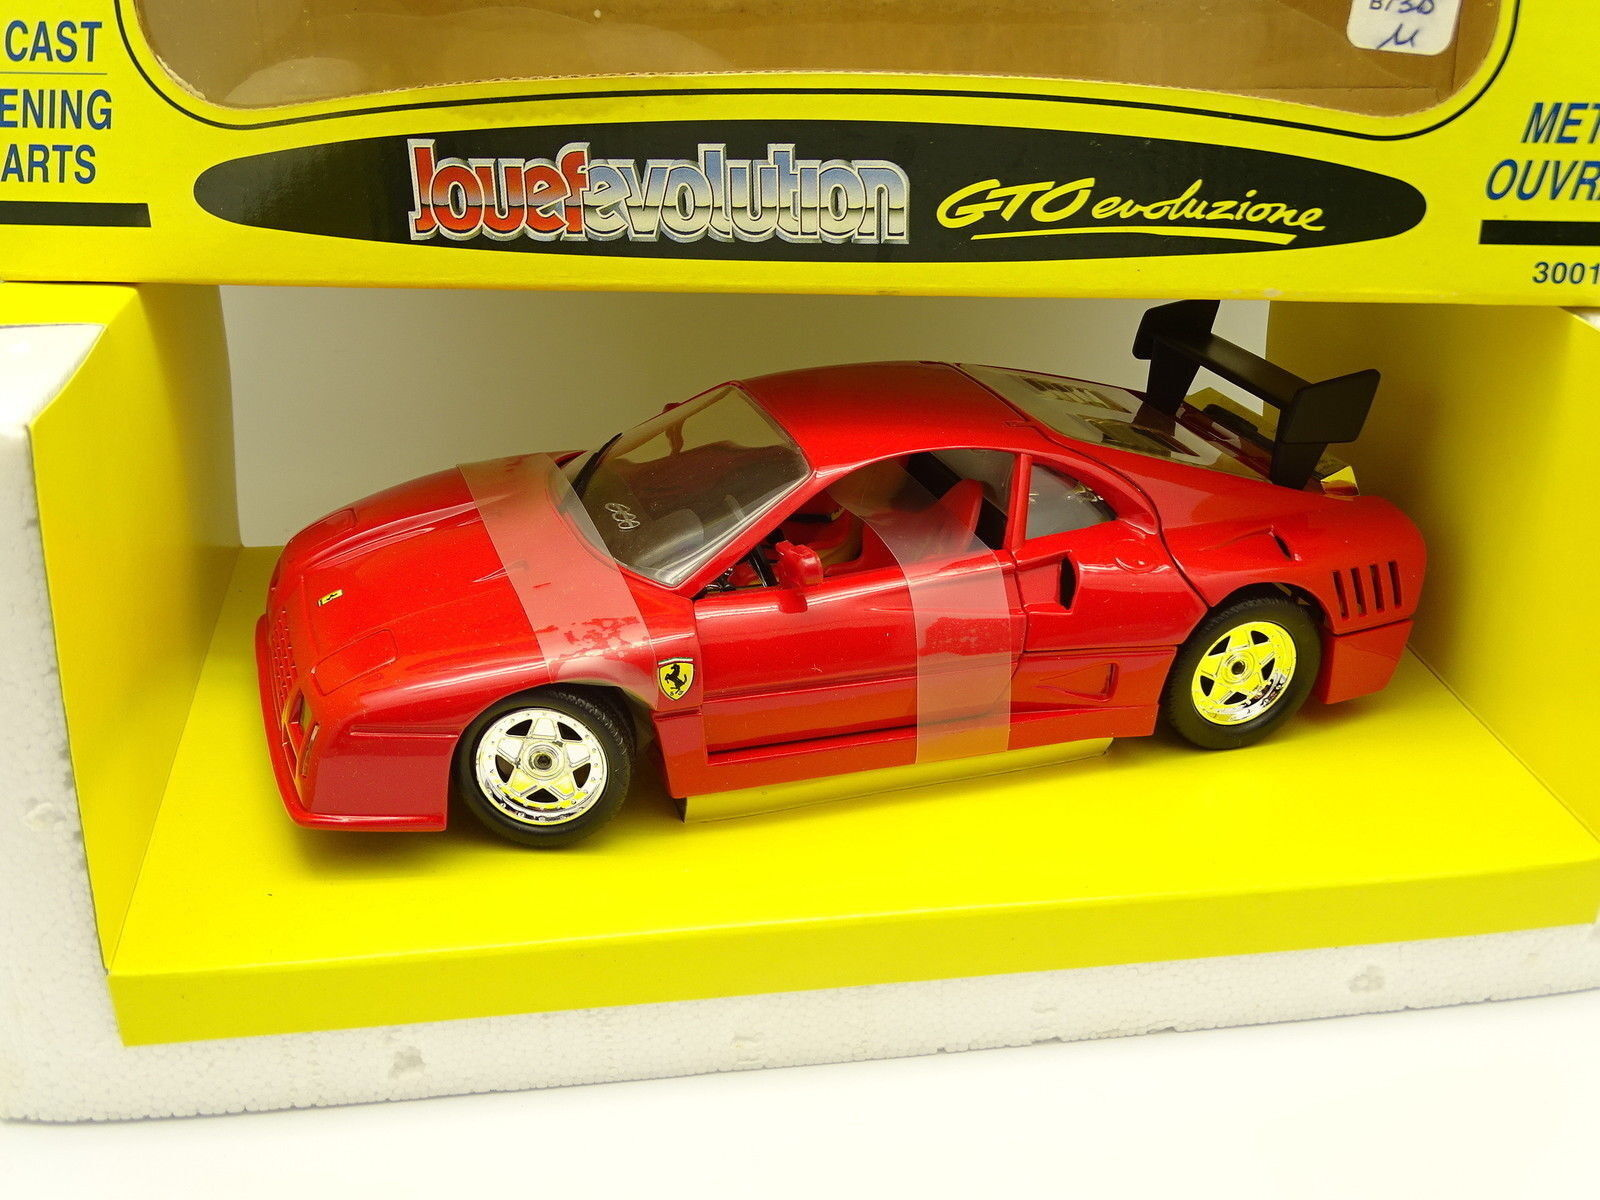 Evolución Izquierda 1 18 - Ferrari GTO Evoluzione rojo